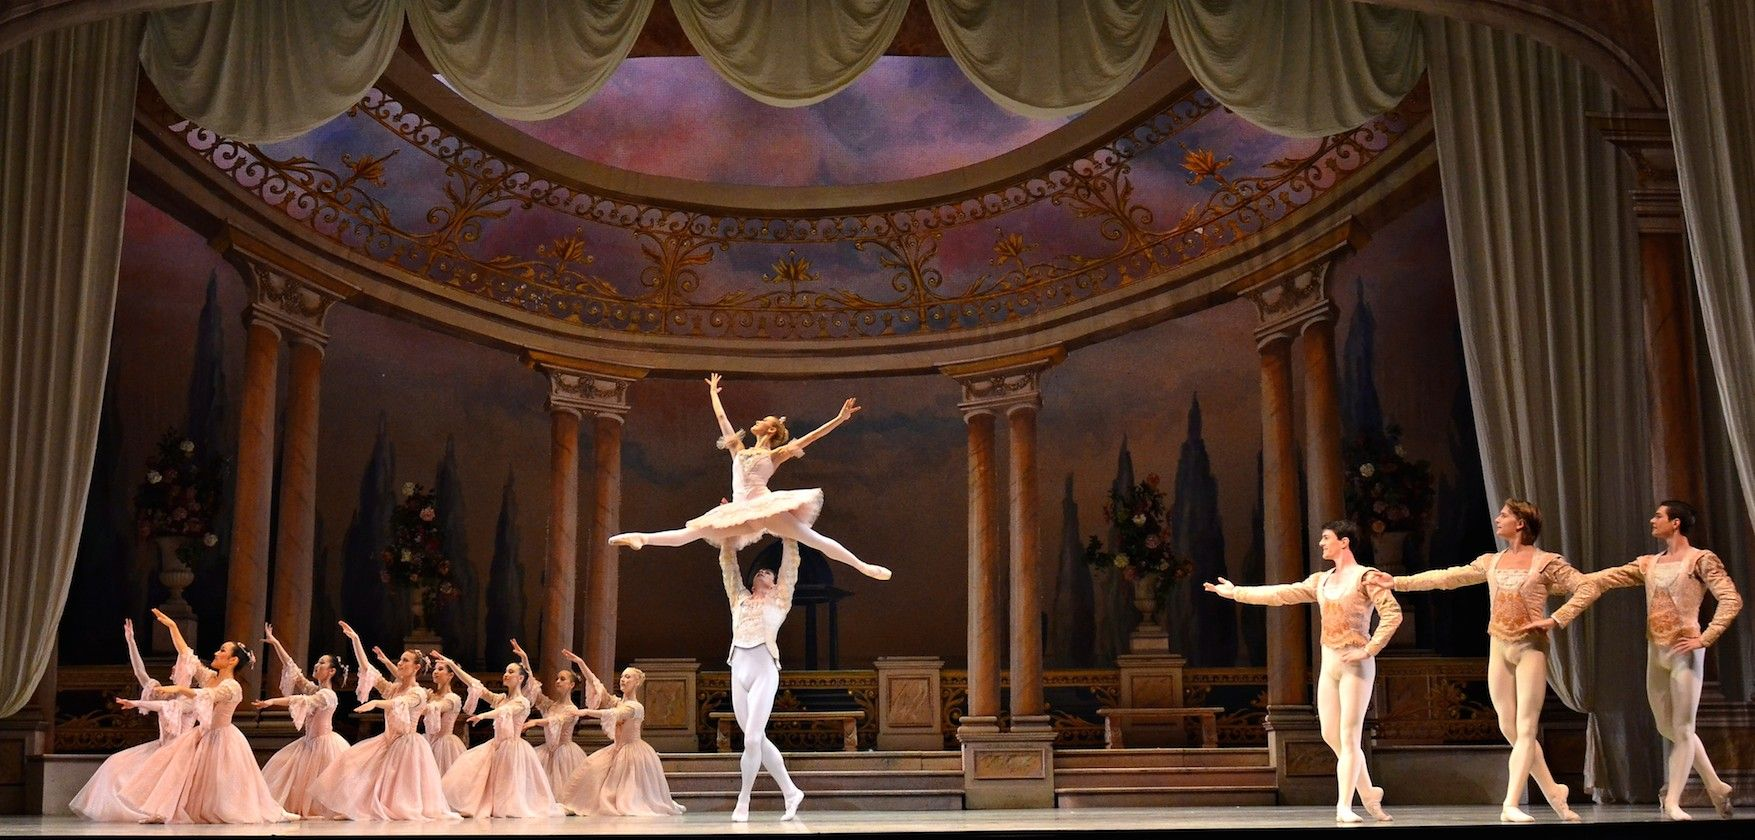 Nutcracker by Royal Winnipeg Ballet. Photo: Vince Pahkala